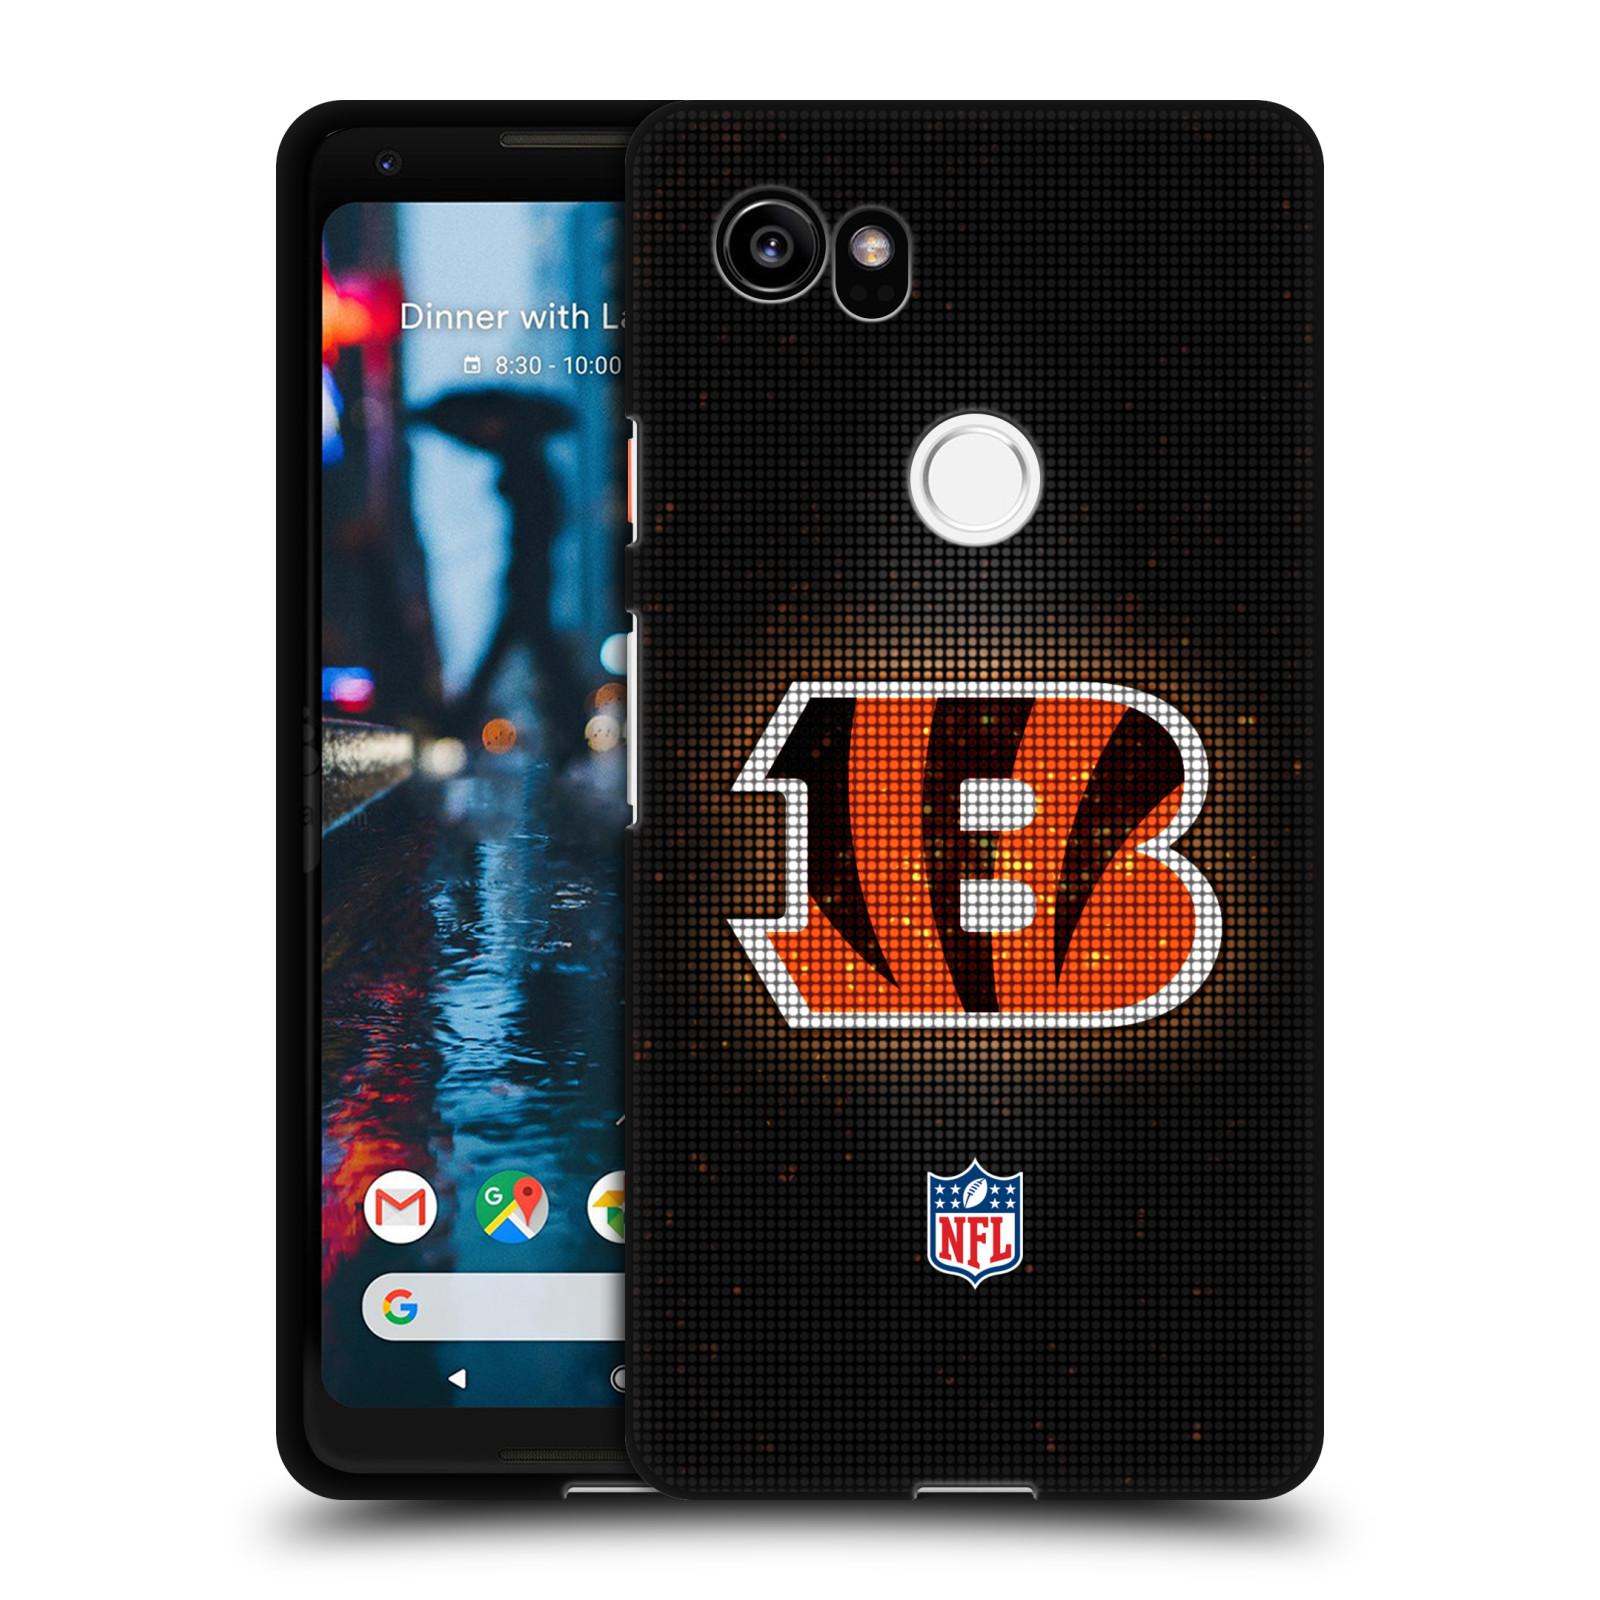 OFFICIAL-NFL-2017-18-CINCINNATI-BENGALS-BLACK-SOFT-GEL-CASE-FOR-GOOGLE-PHONES